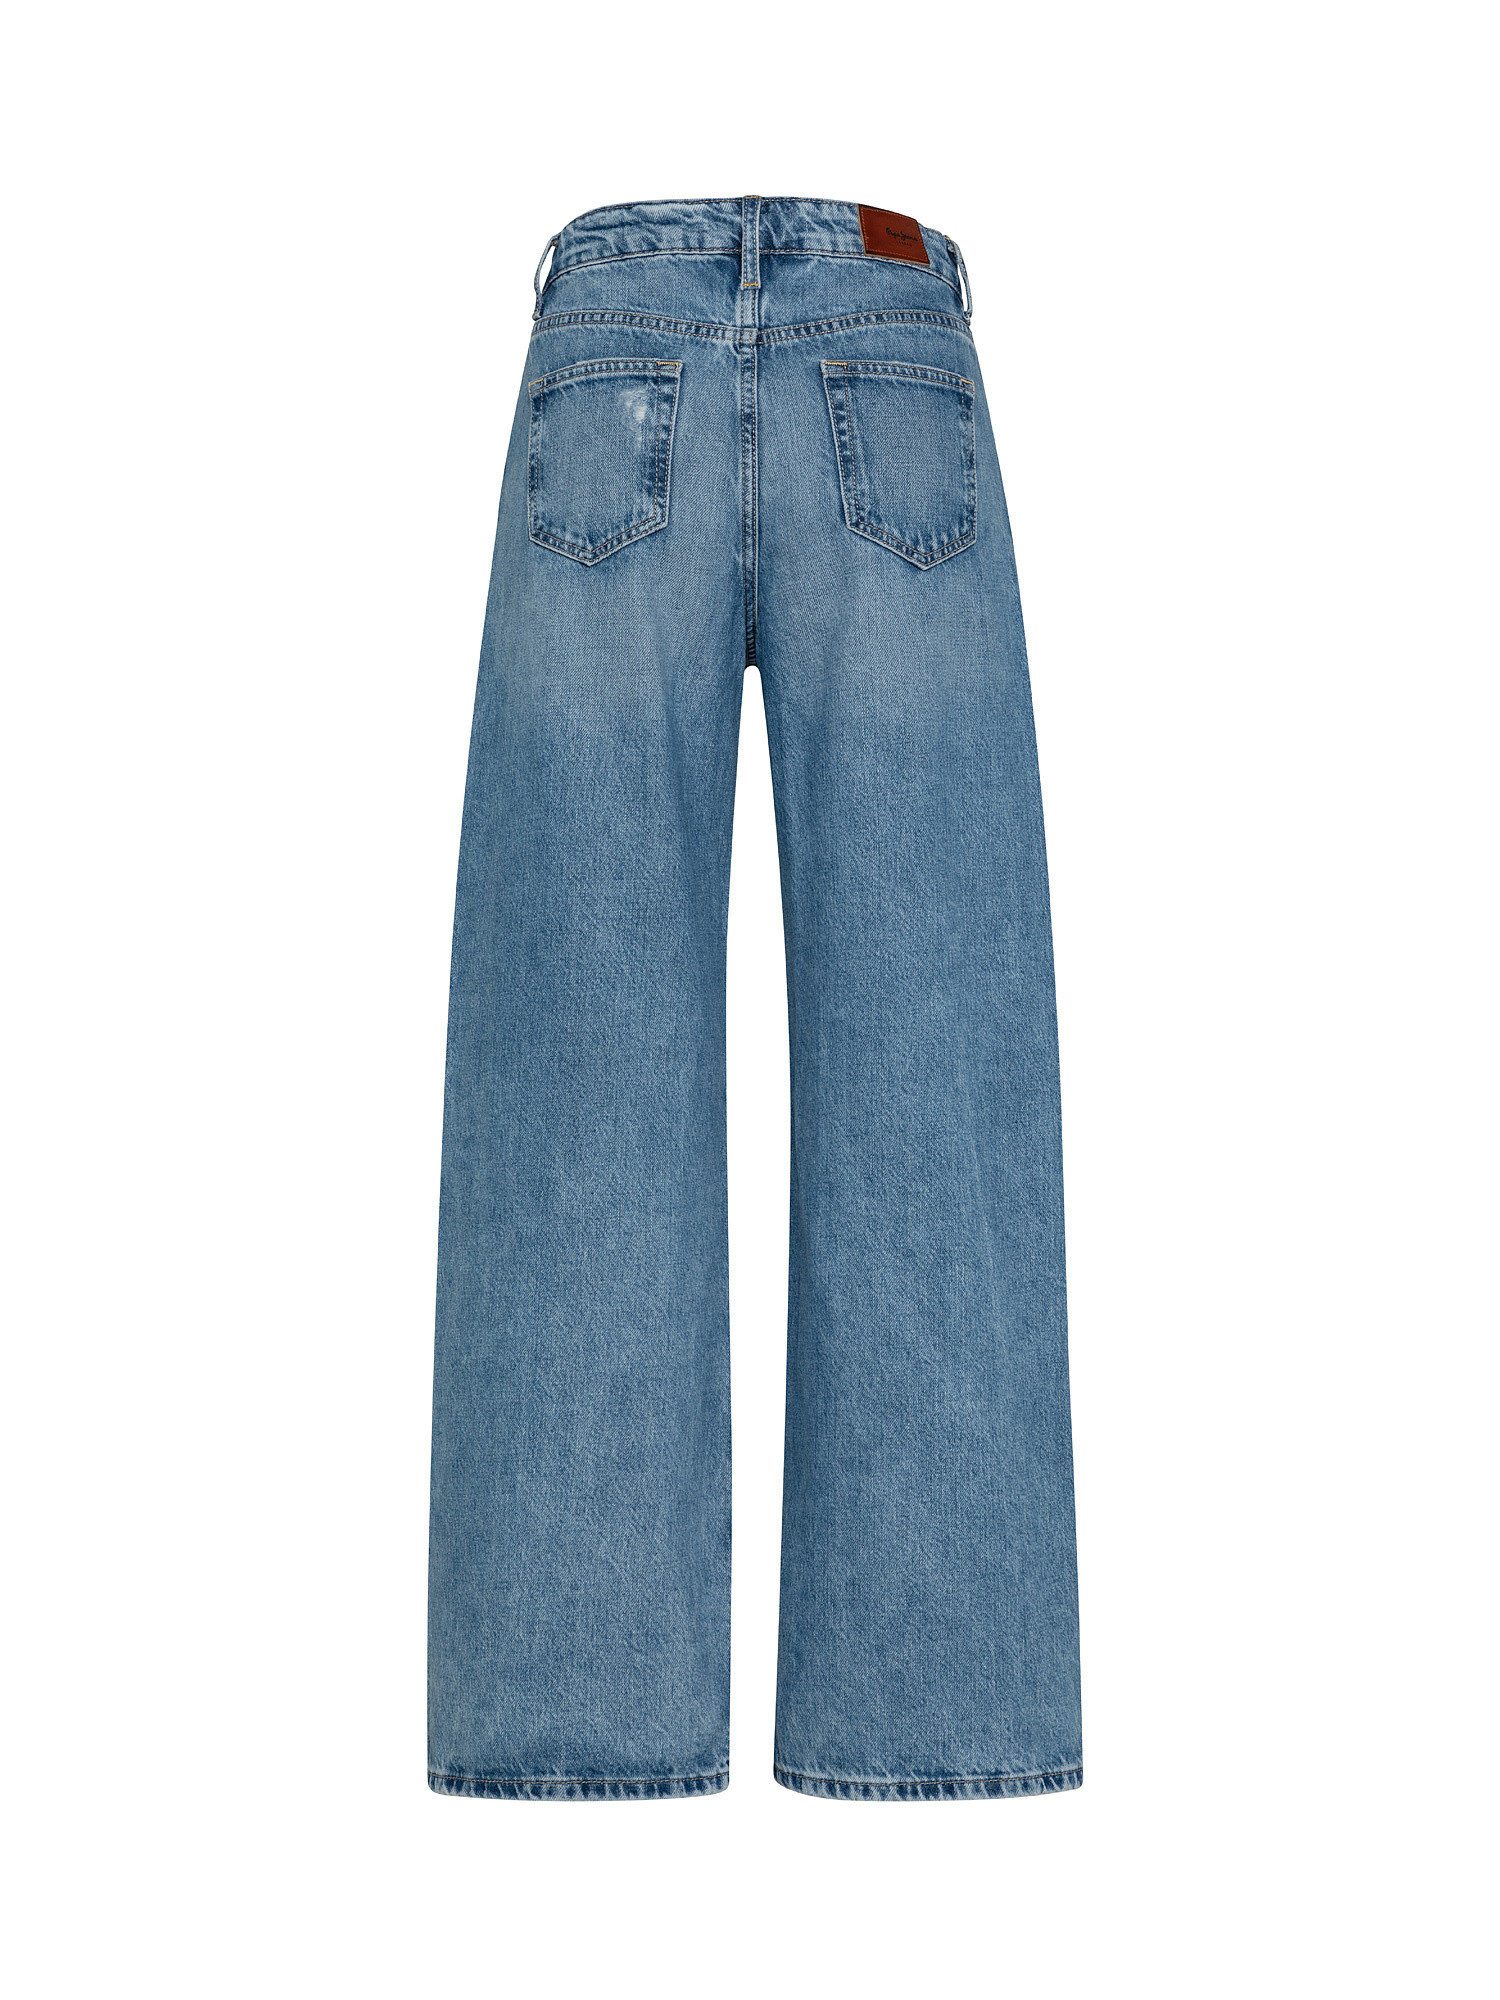 Jeans donna Faith, Denim, large image number 1